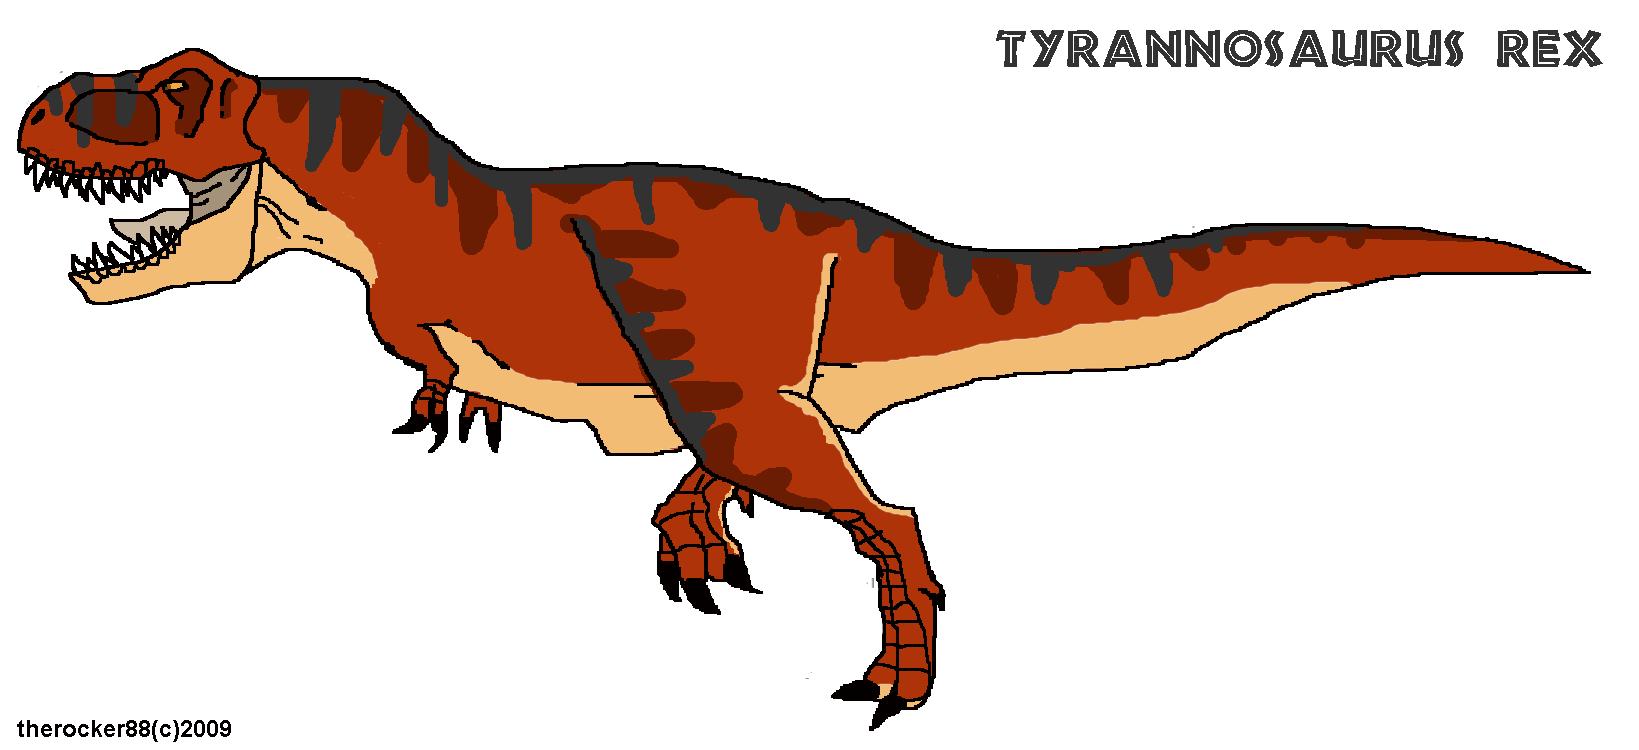 Tyrannosaurus Rex by Ergo-Palsy